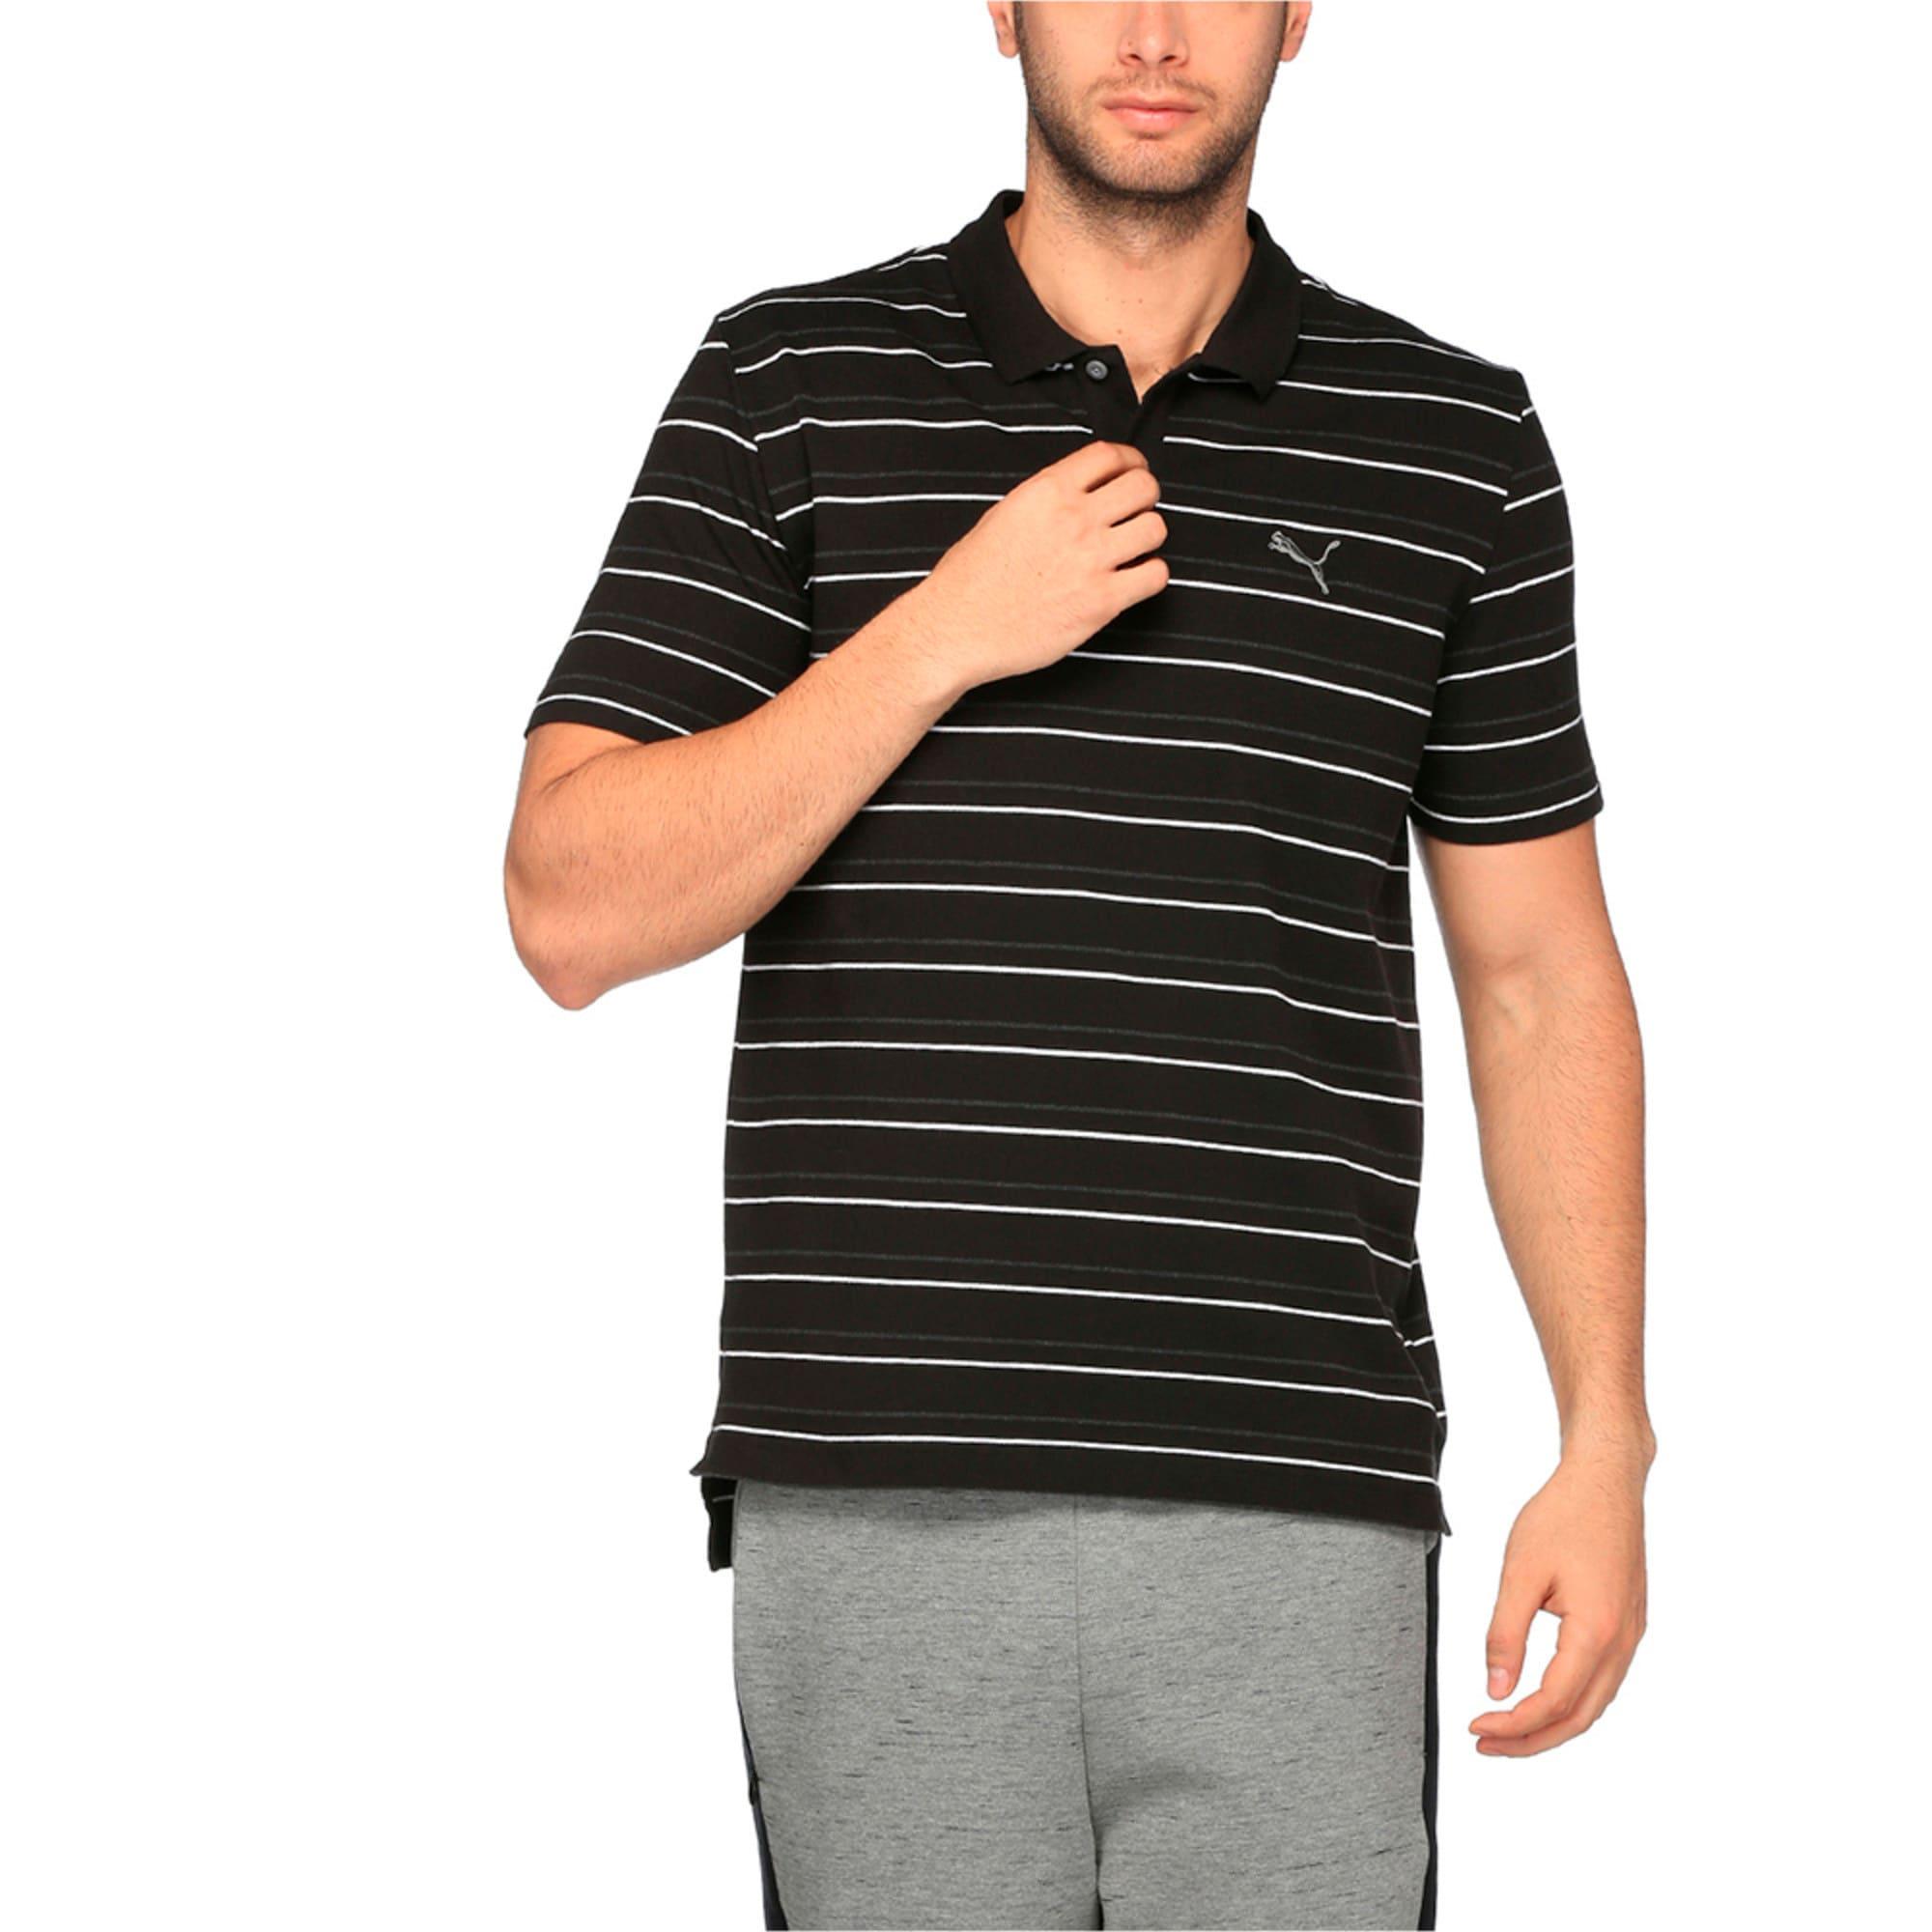 Thumbnail 1 of Sports Stripe Pique Polo, Cotton Black, medium-IND